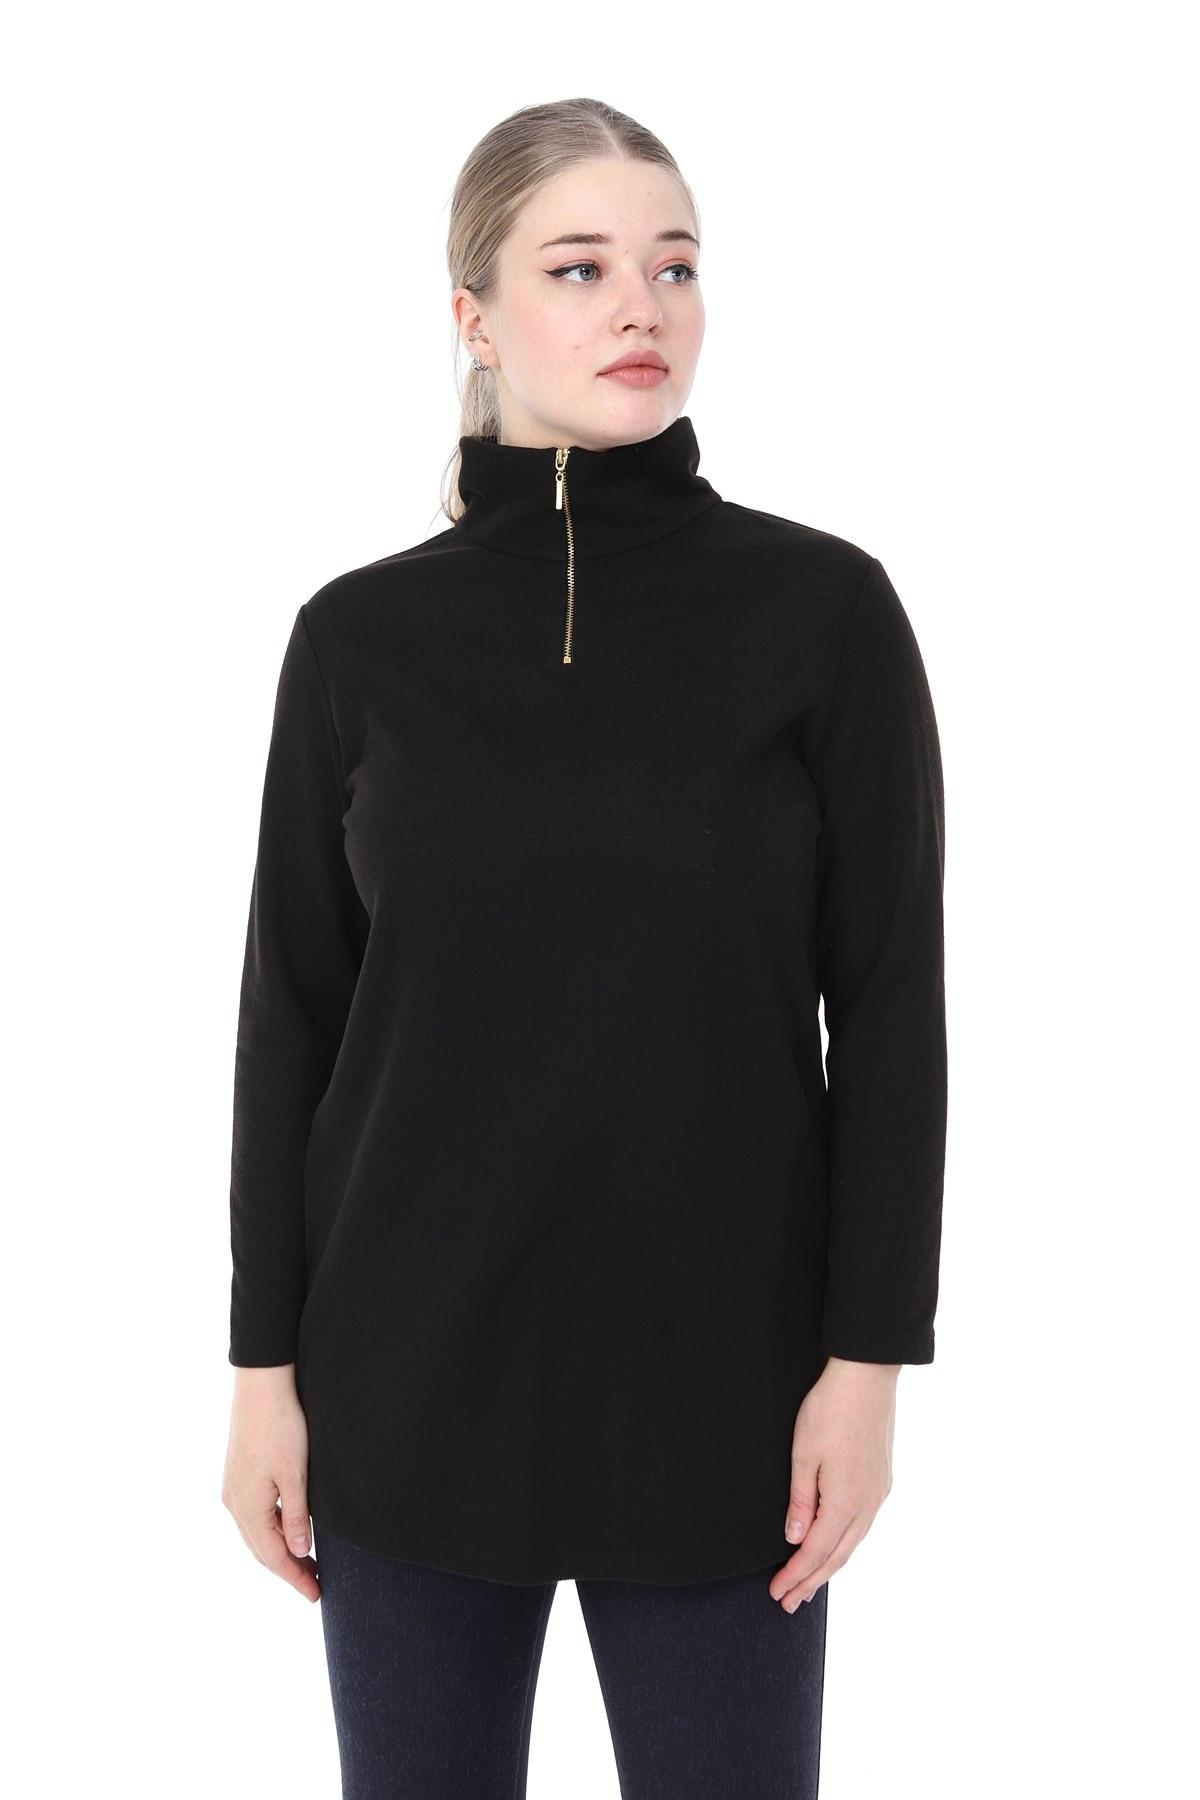 Women's Plus Size Long Sleeve turn down Collar Zipper Detail Blouse Black L2315